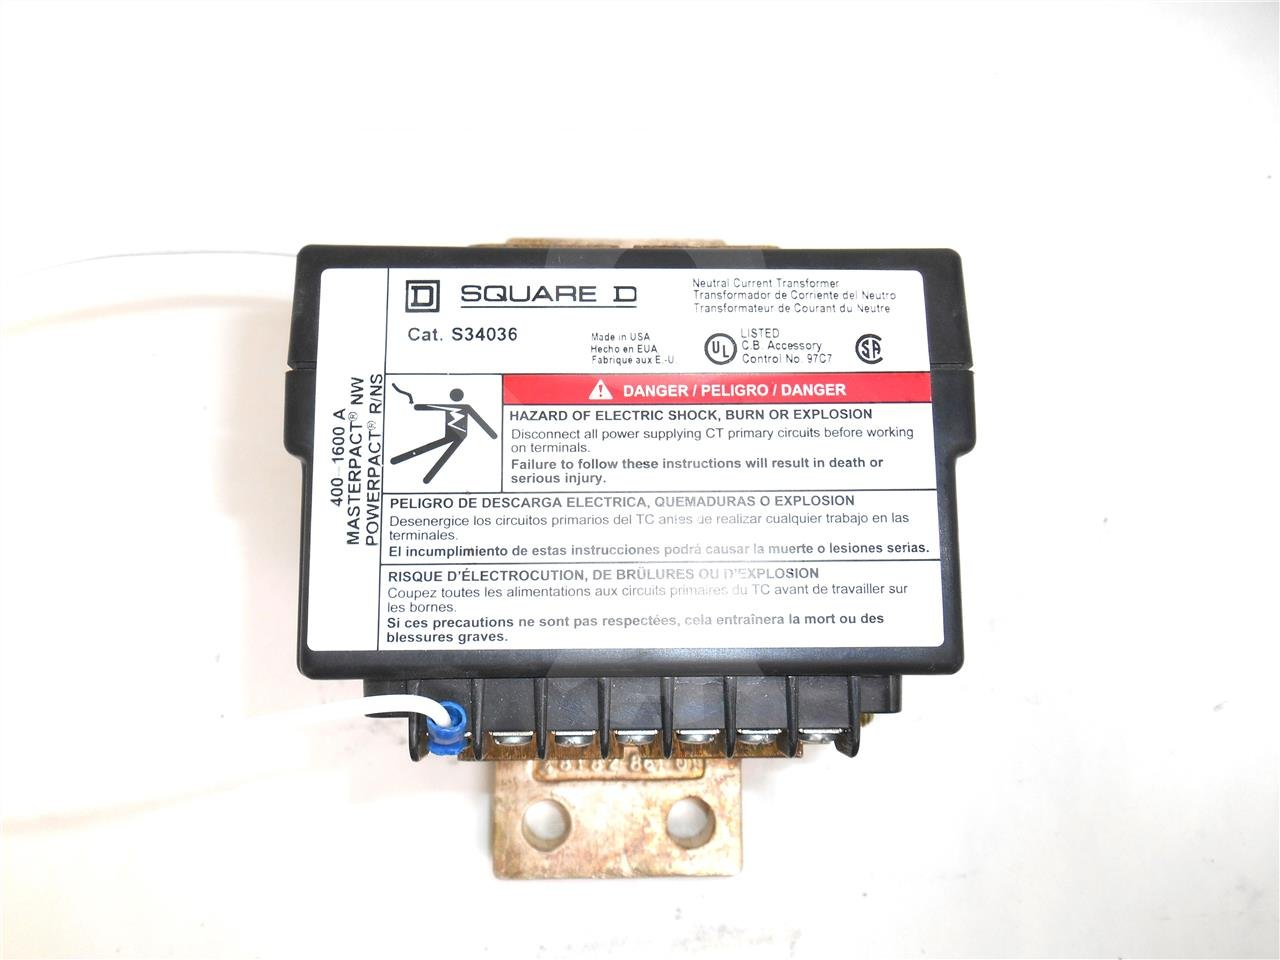 S34036 - 400-1600A NEUTRAL CURRENT TRANSFORMER, MICROLOGIC